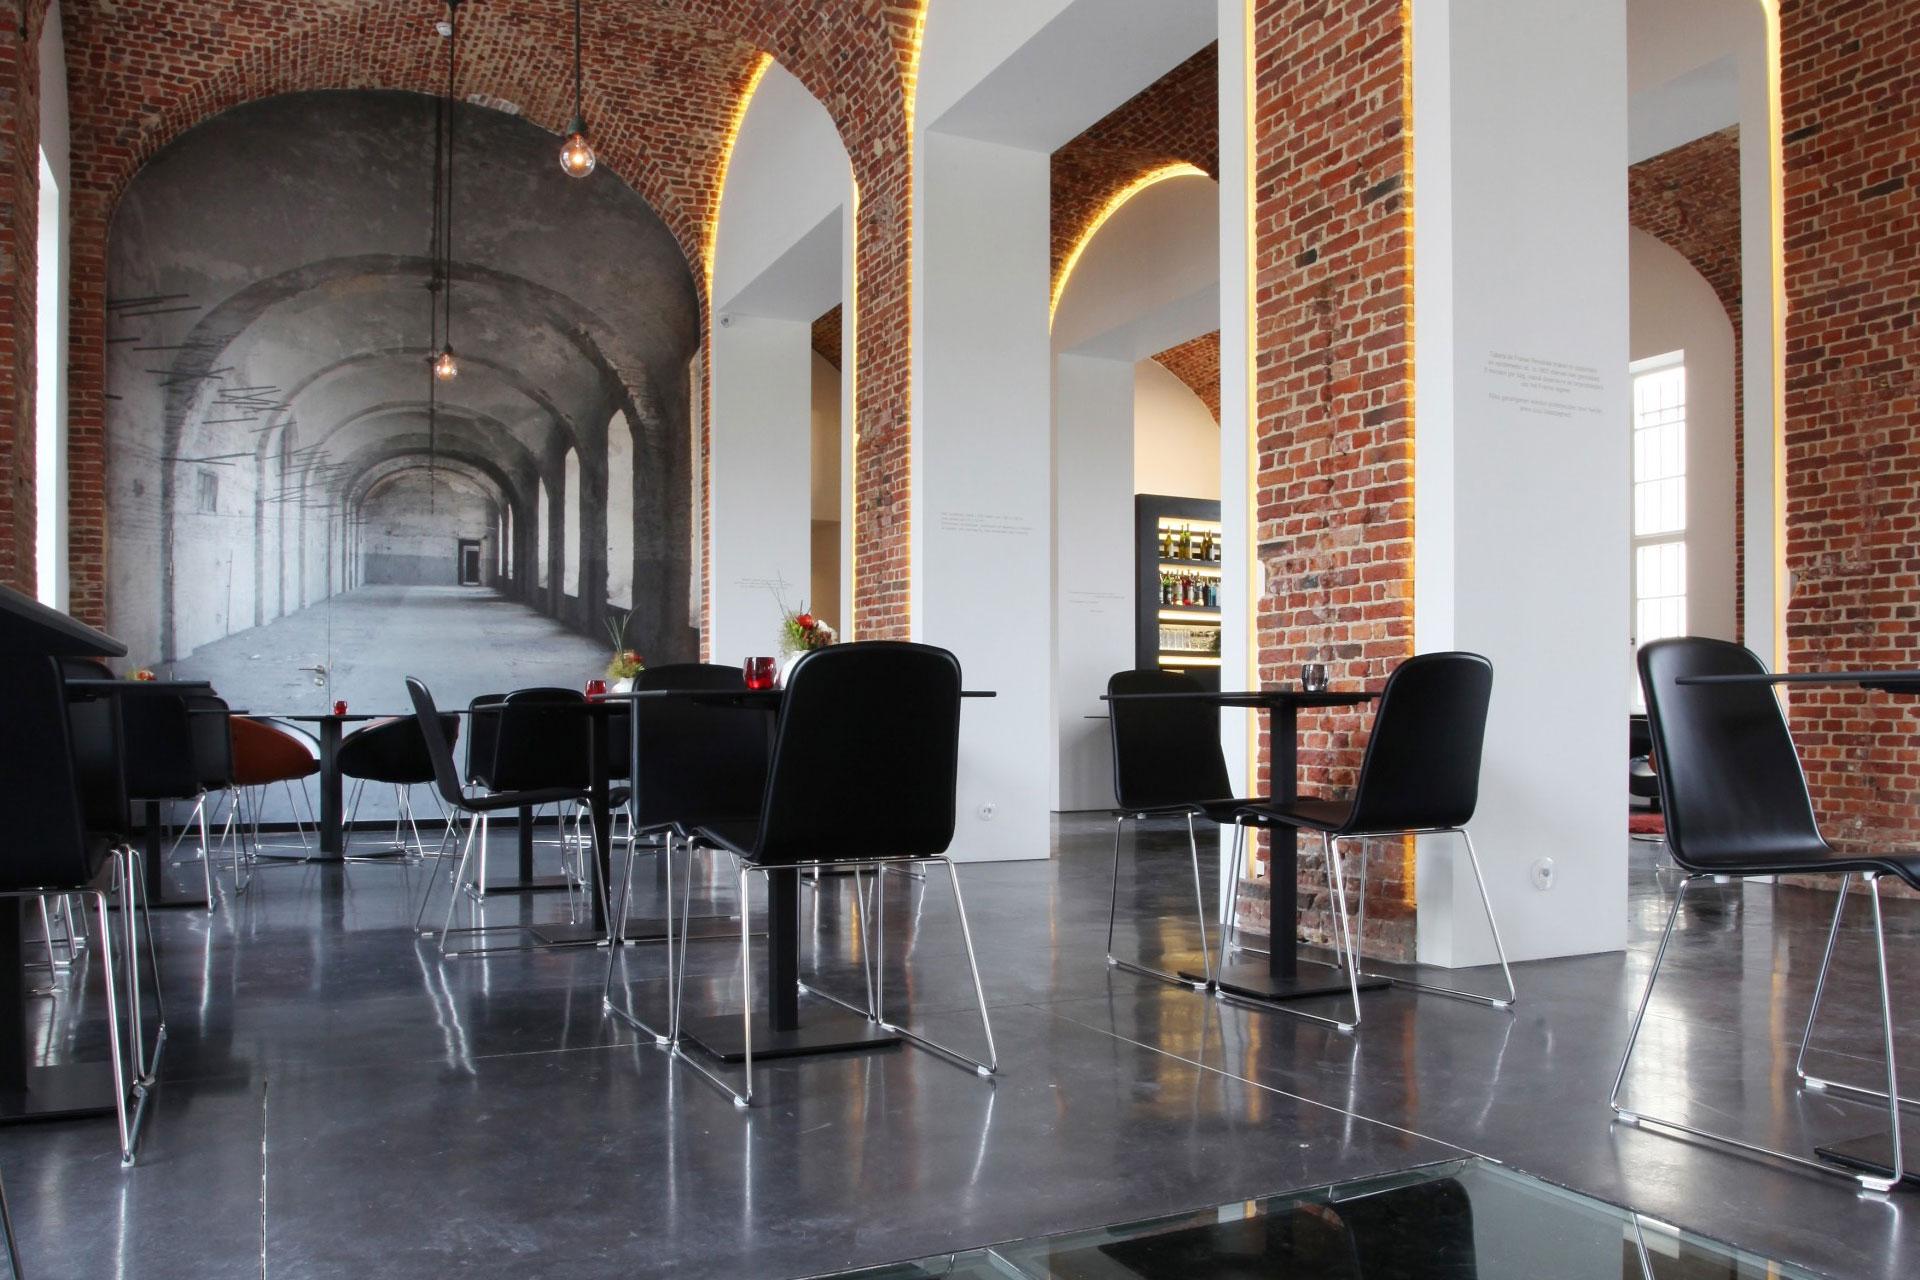 tuchthuis zwarte betonvloeren